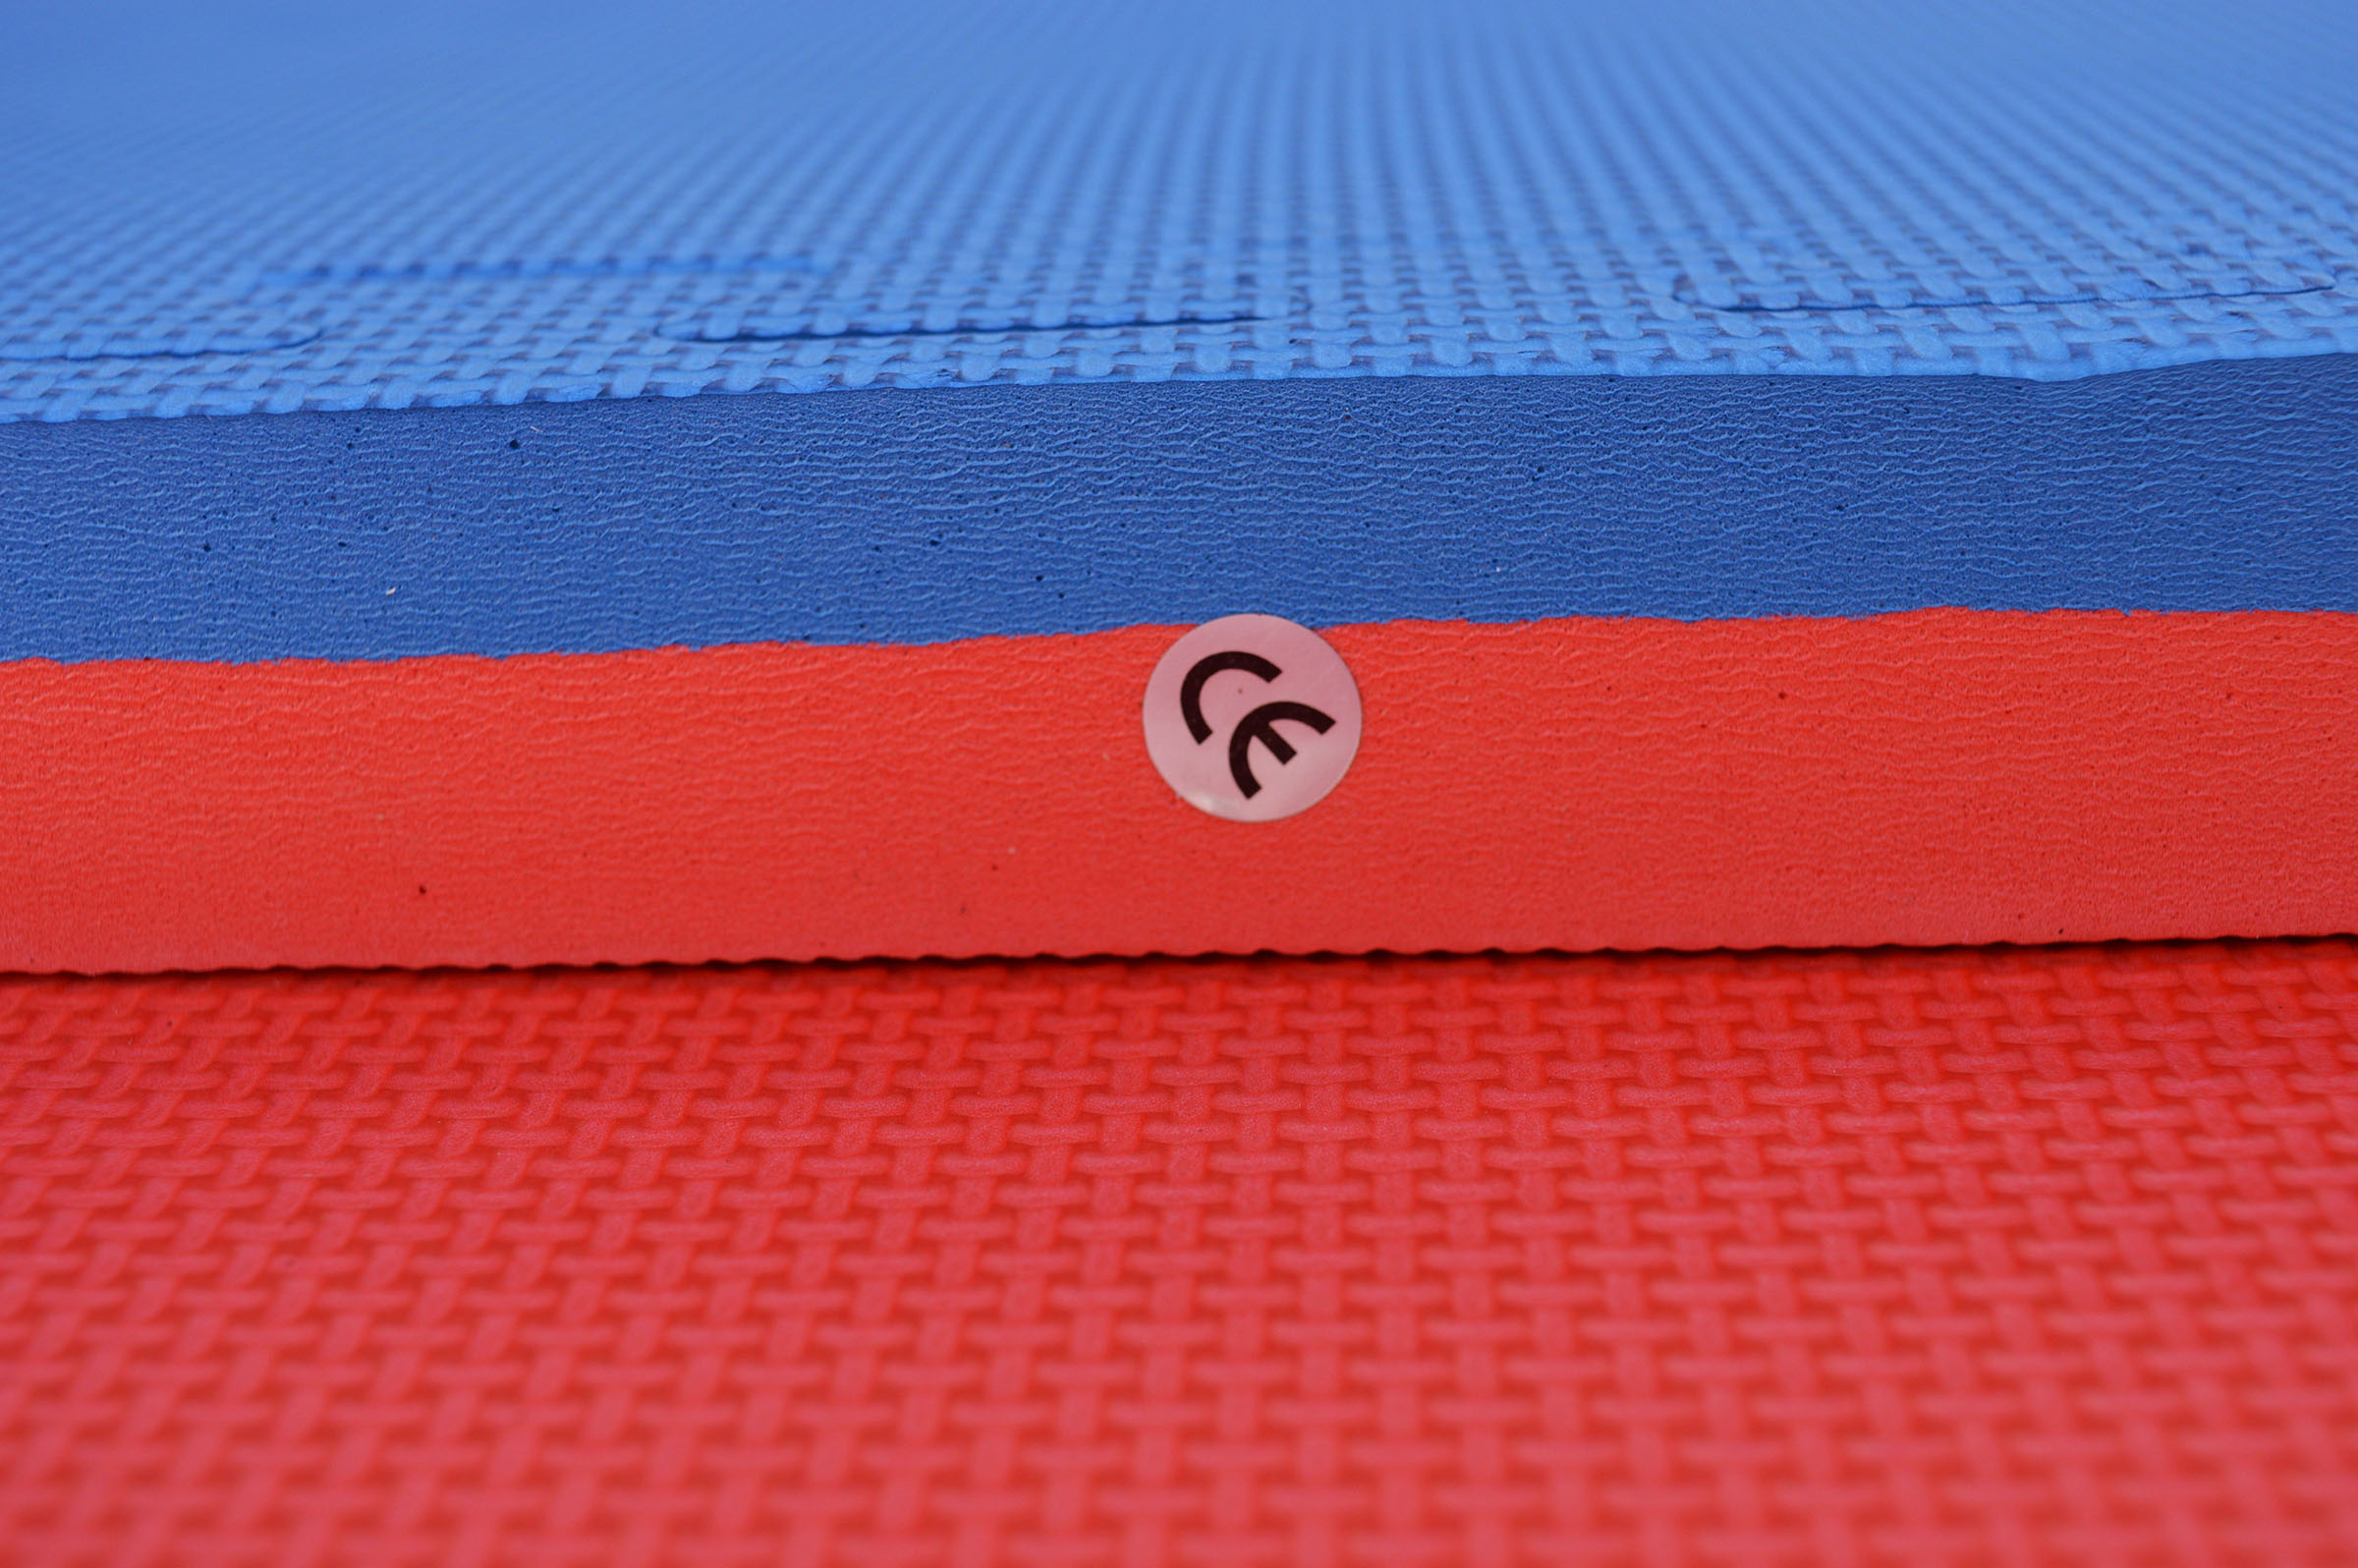 Puzzle Mat 4cm Blue Red Dragonsports Eu